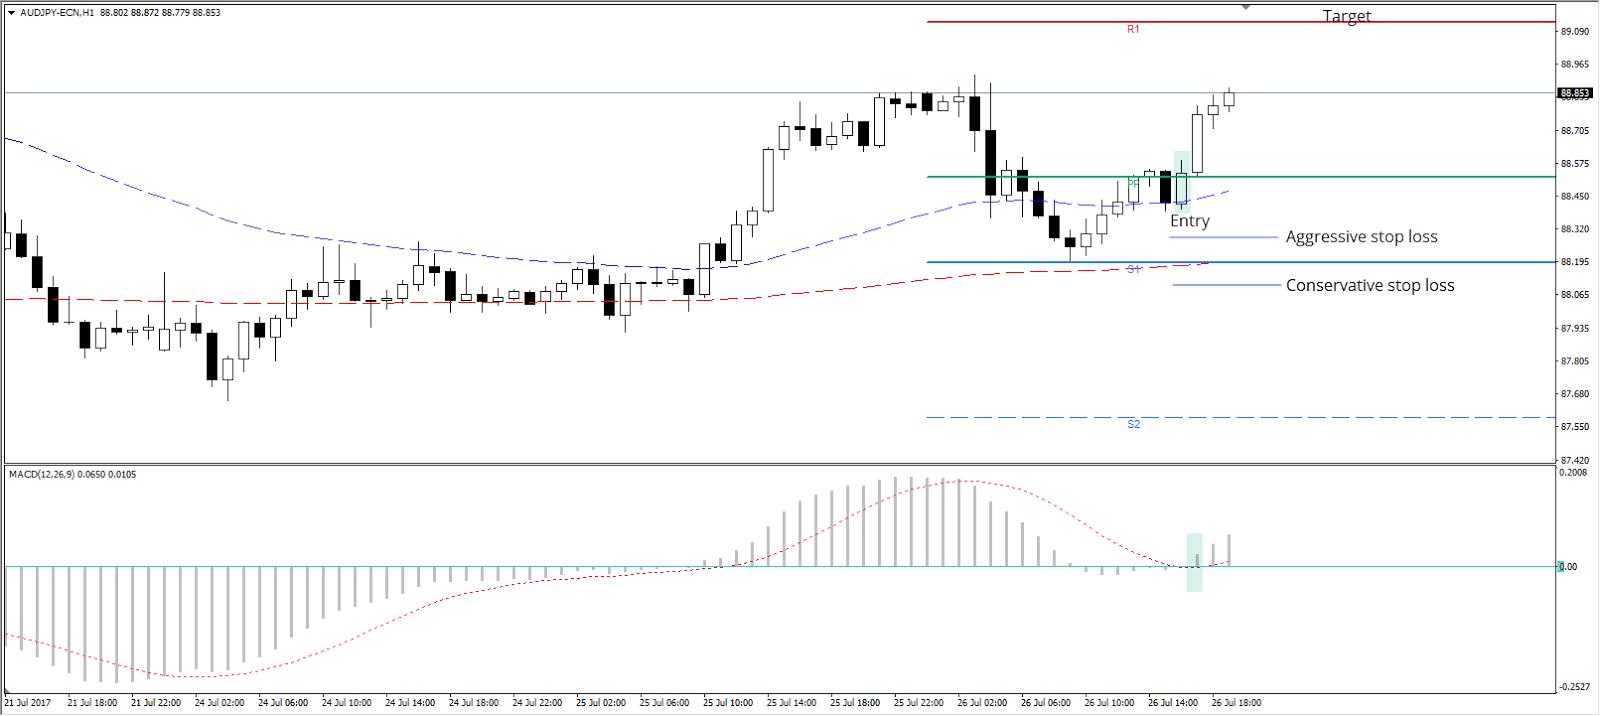 aggressive stop loss AUD/JPY H1 Chart